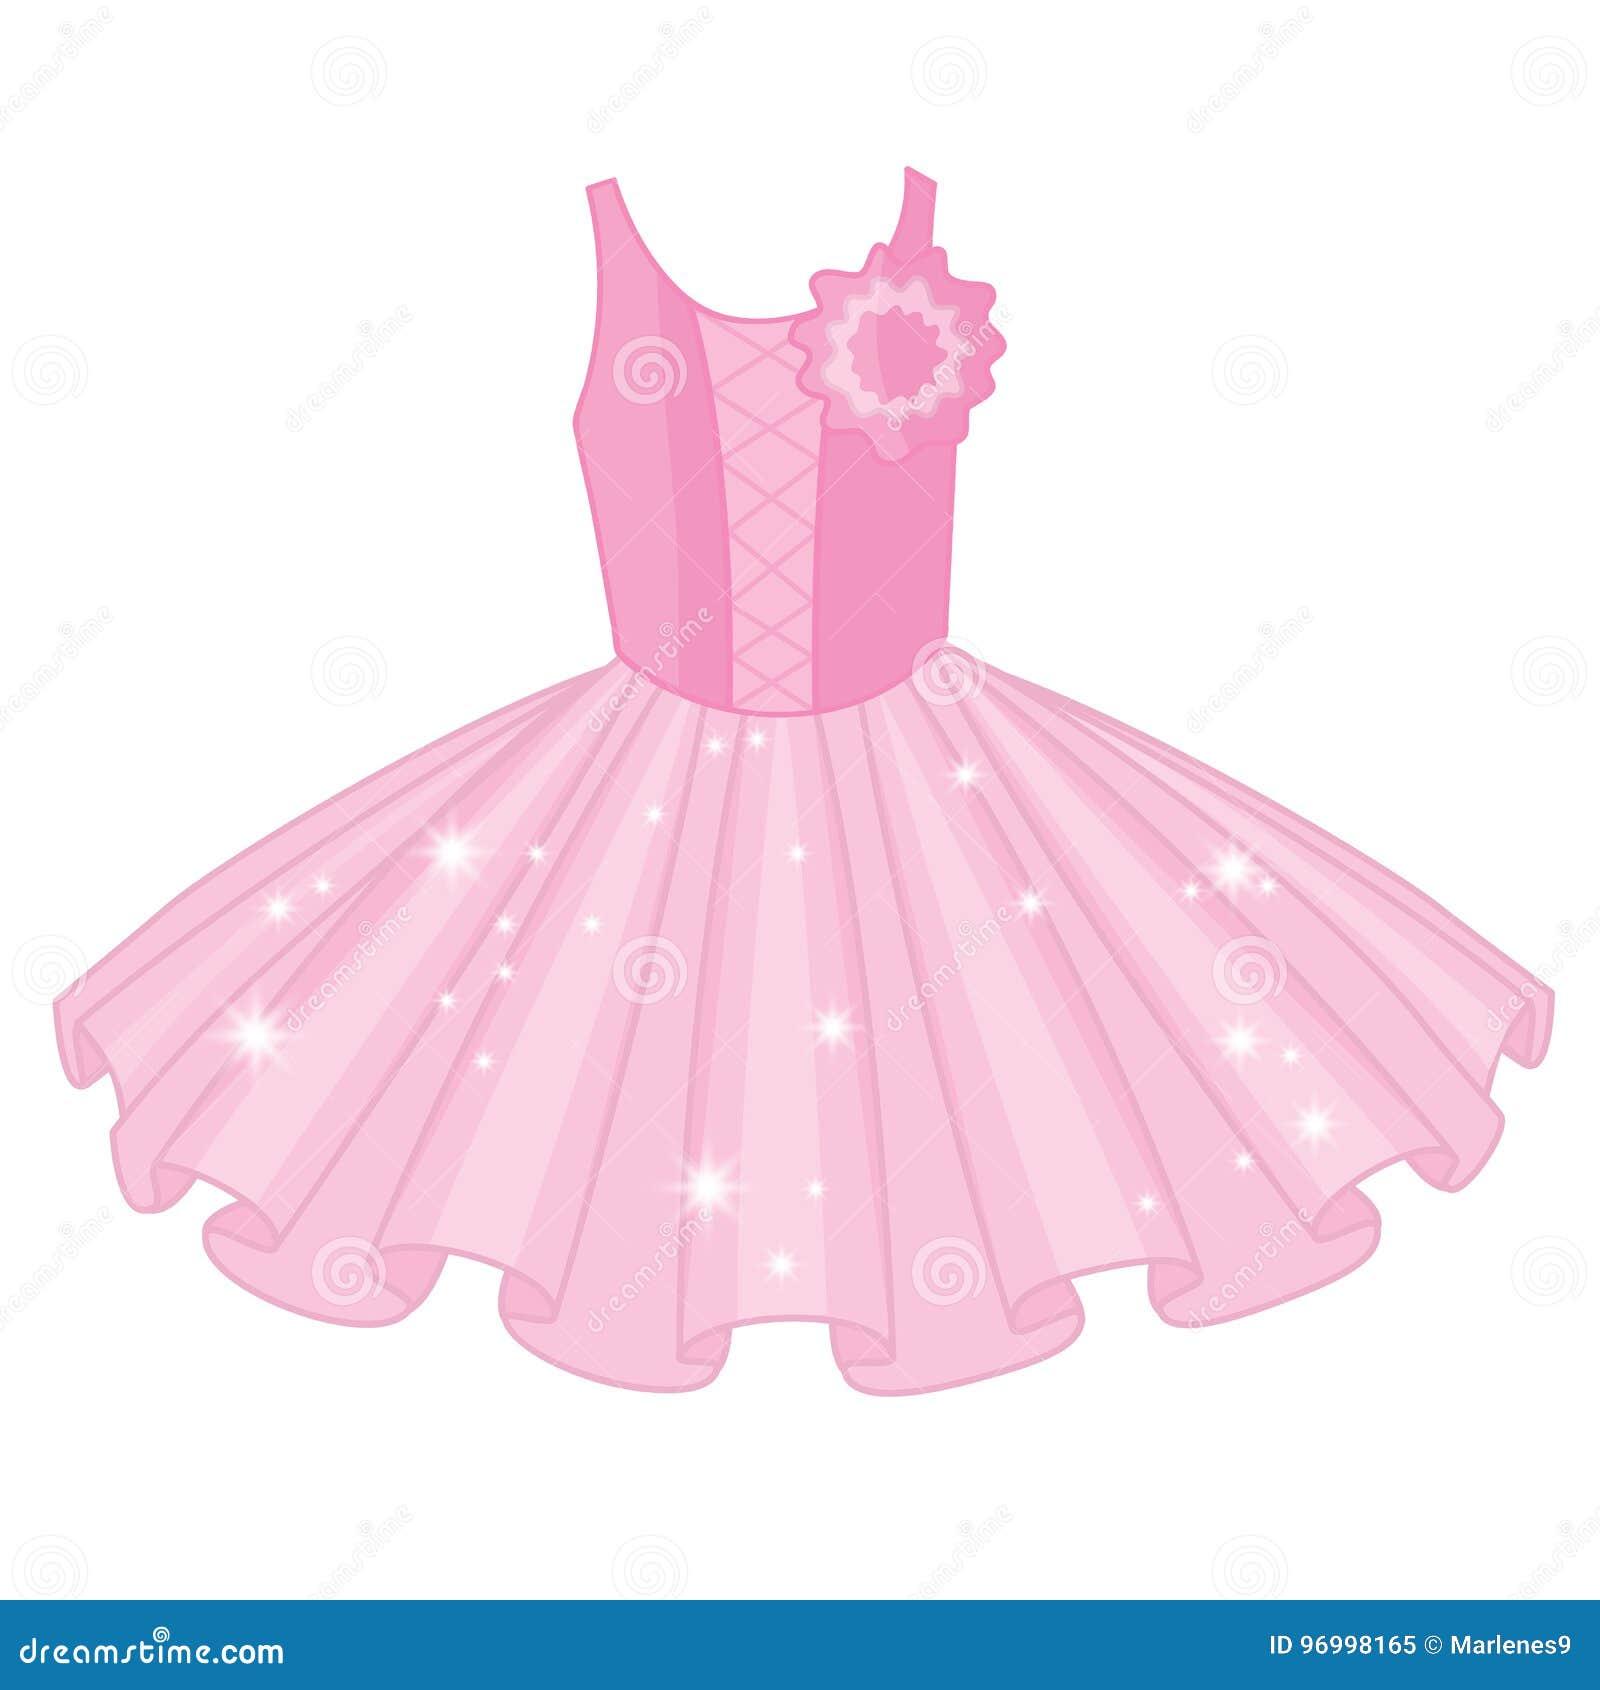 e538670e544 Διανυσματικό μαλακό ρόδινο φόρεμα tutu Διανυσματικά φορέματα tutu ballerina  ` s Διανυσματική απεικόνιση φορεμάτων μπαλέτου